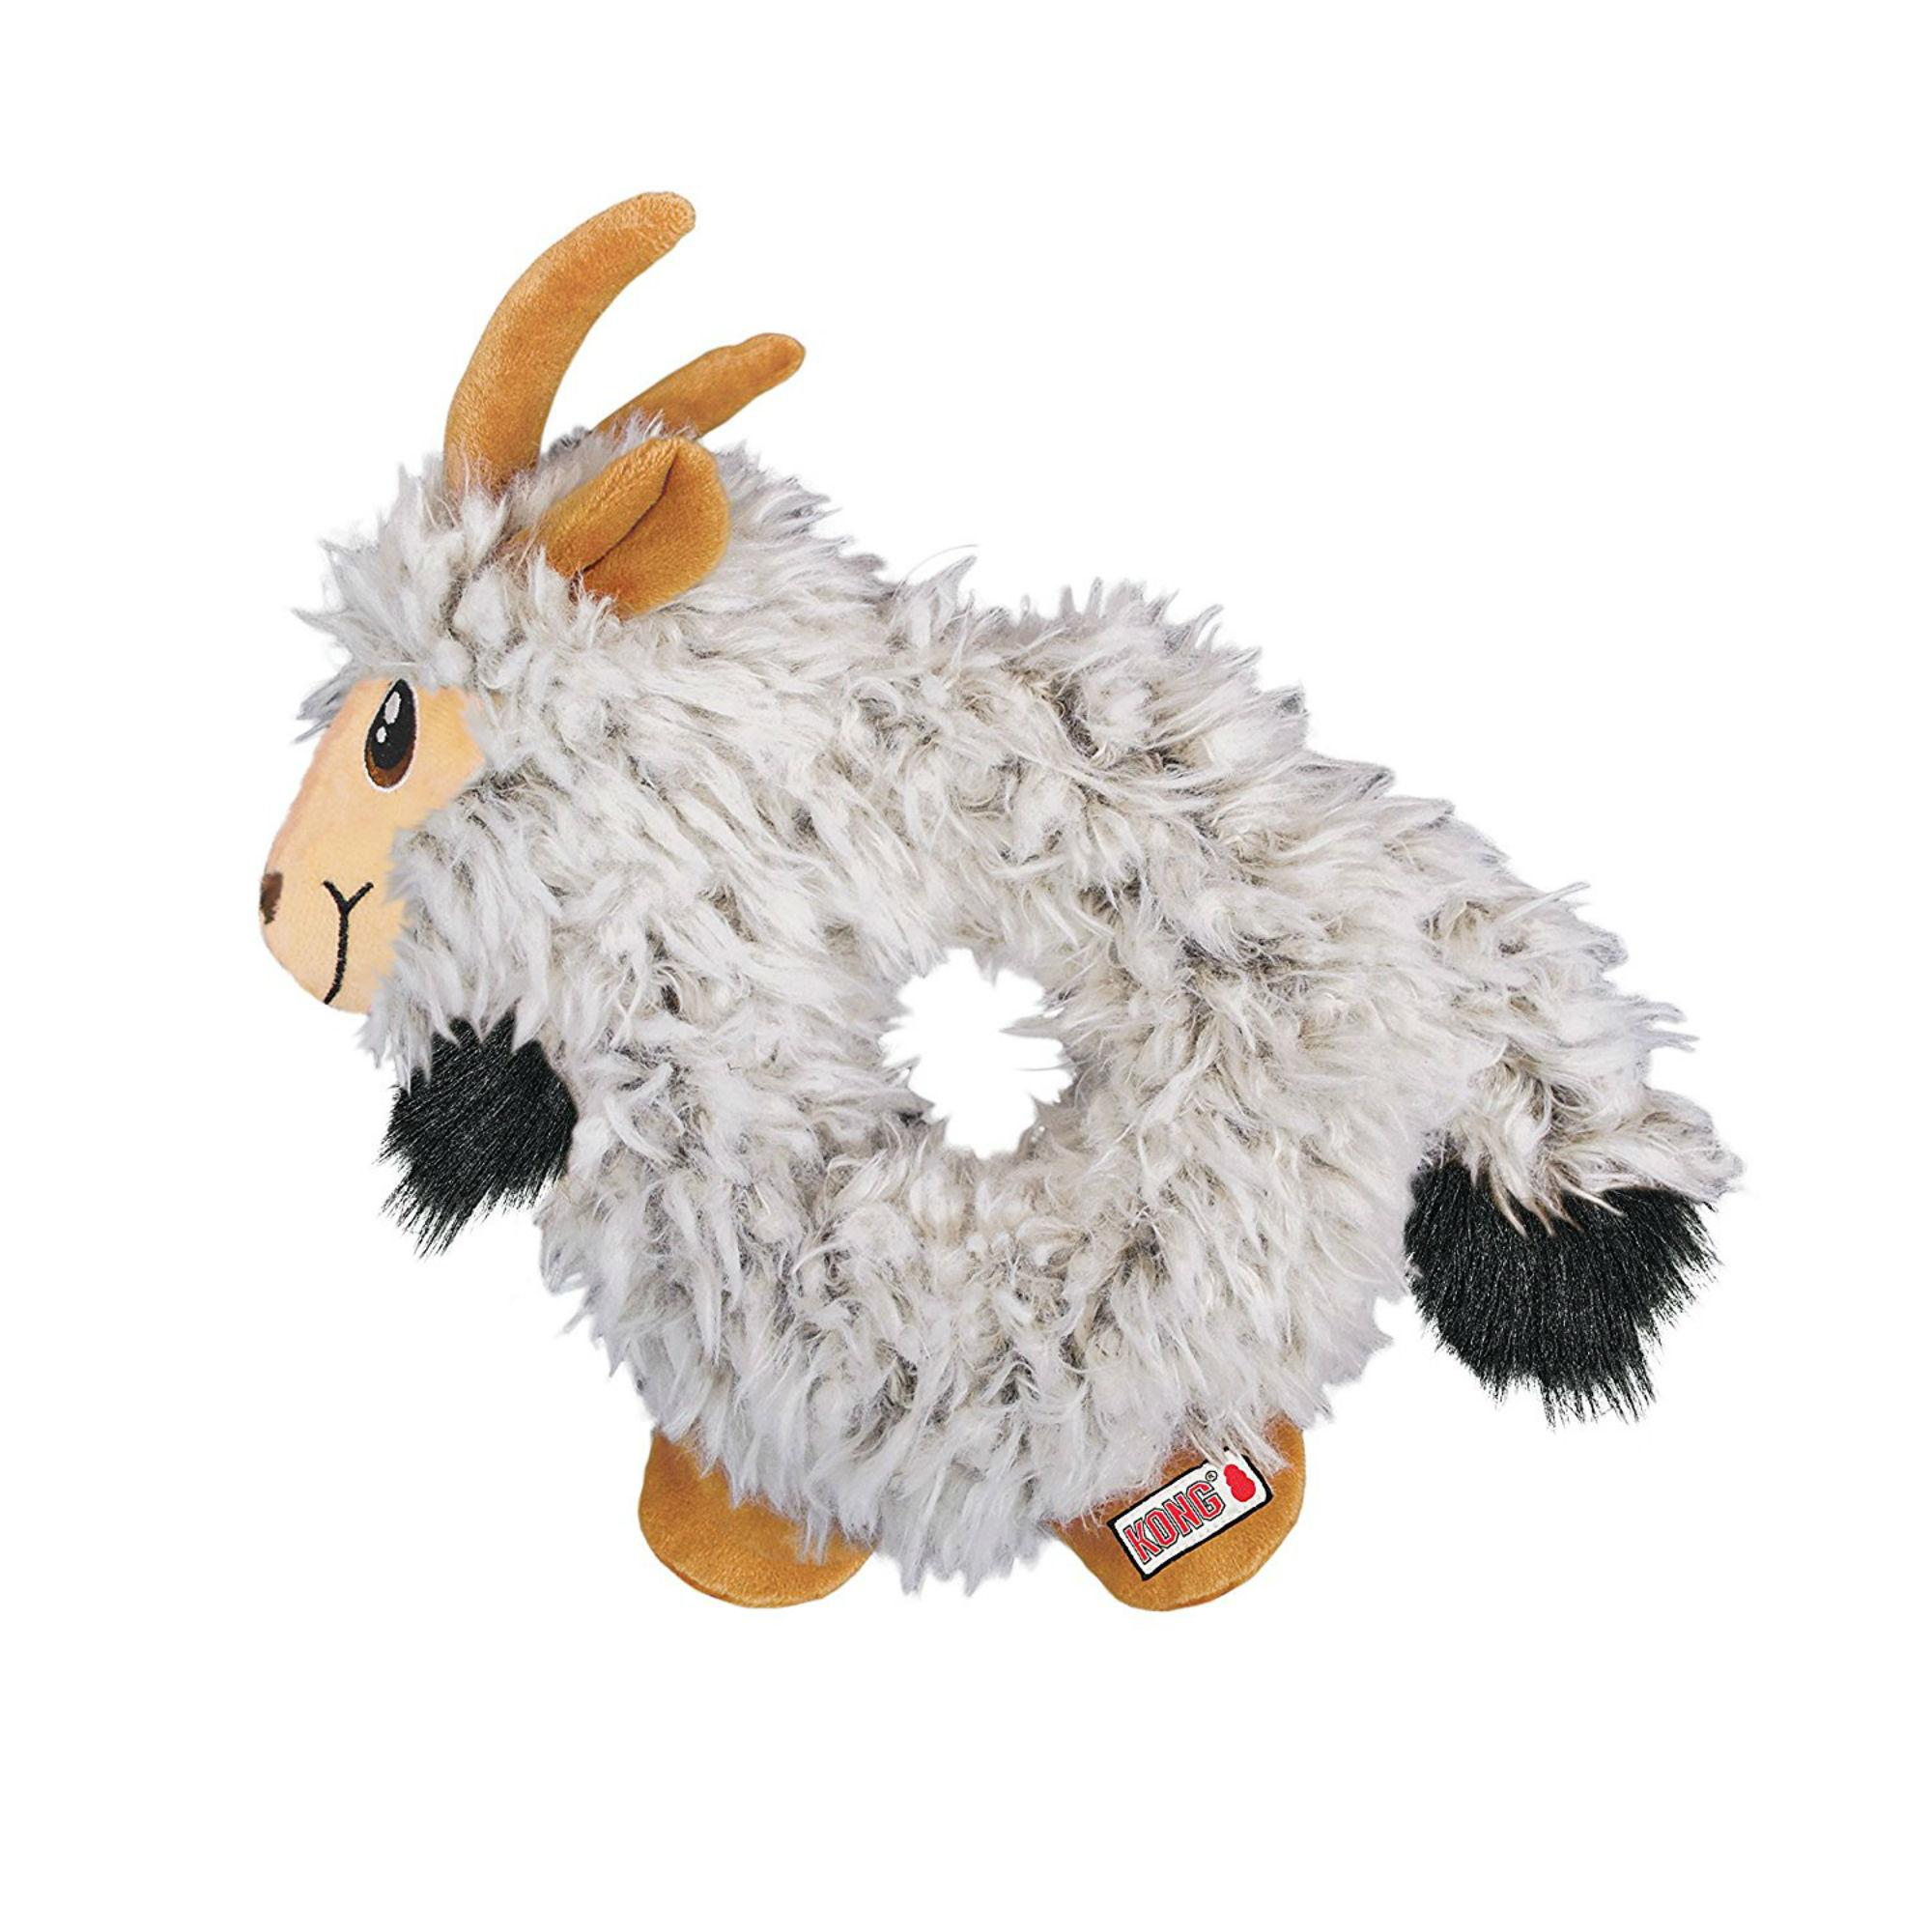 KONG Trekkers Dog Toy - Goat